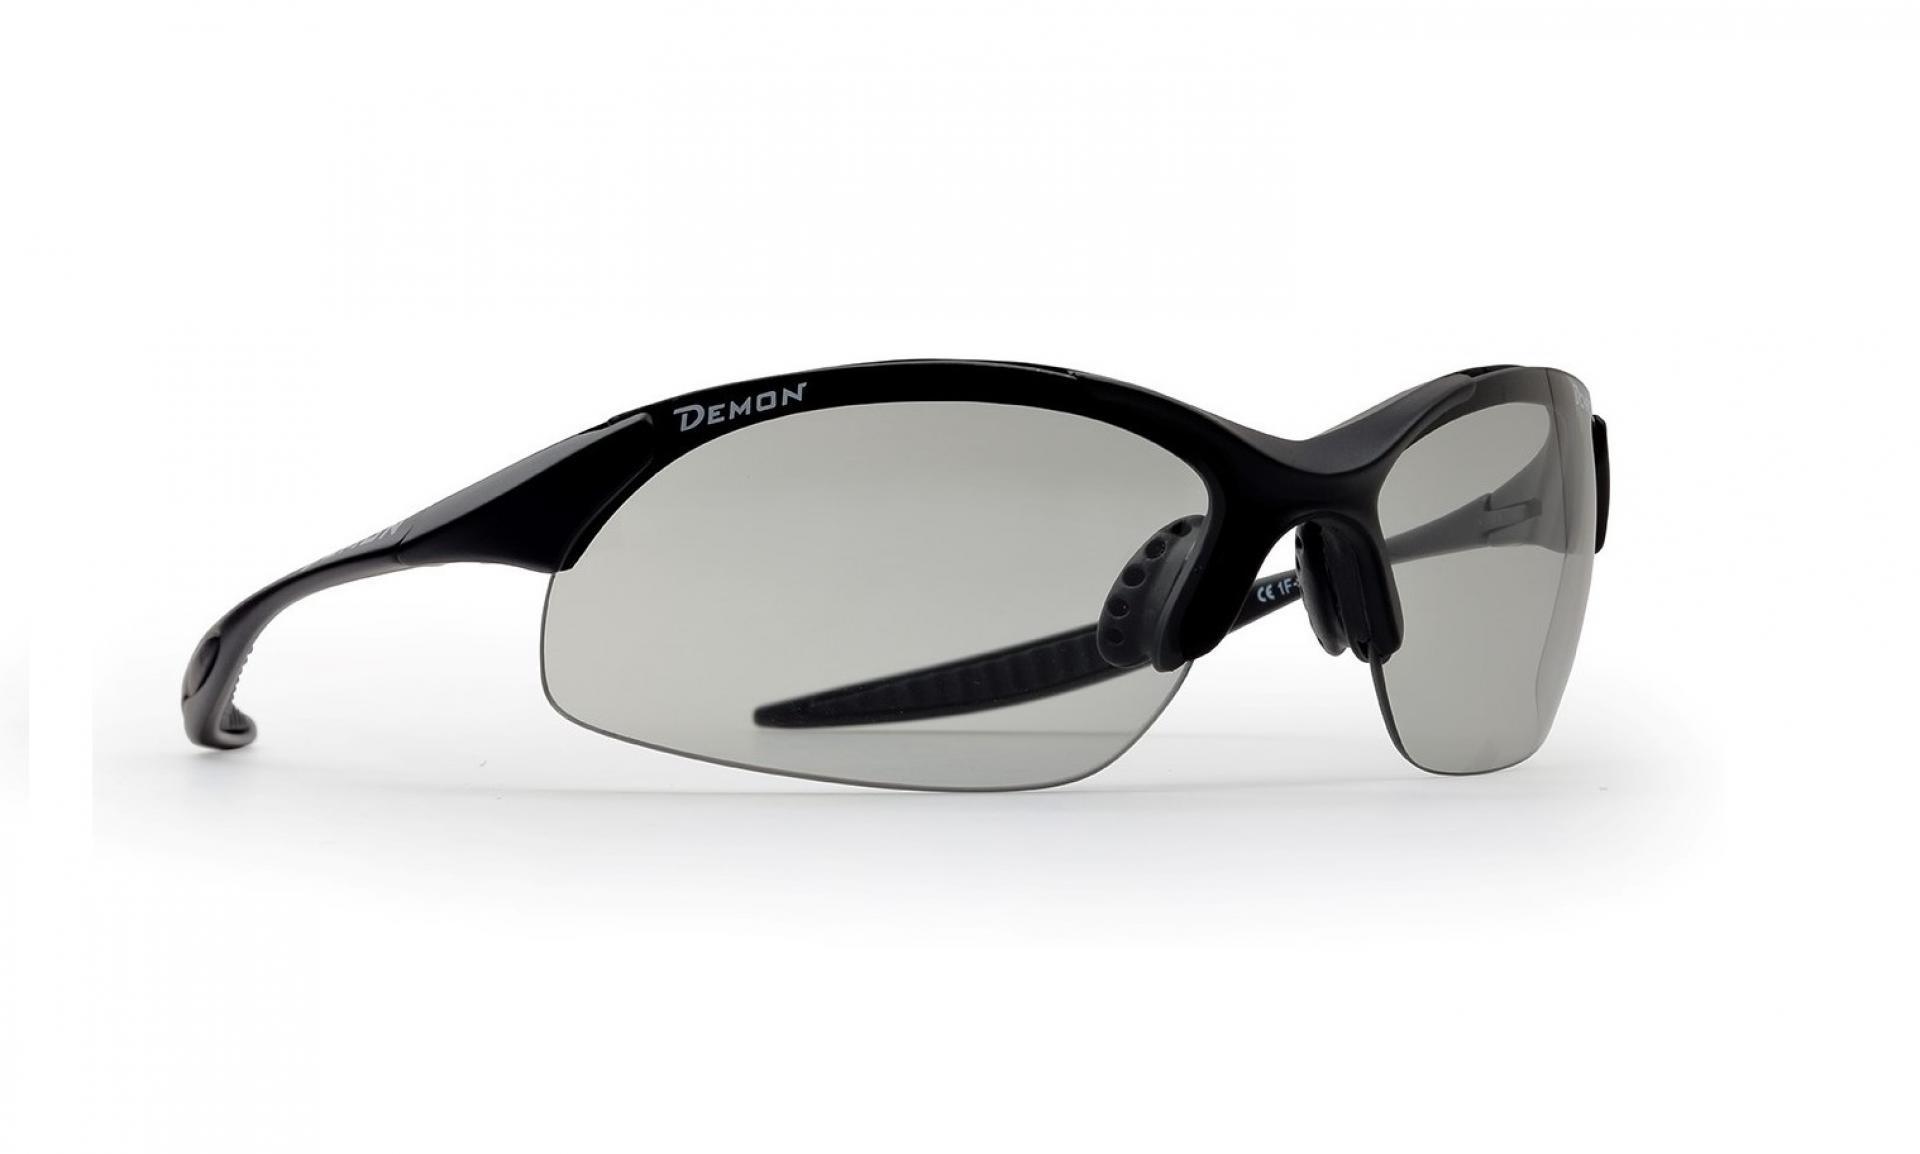 Demon 832 DCHROM - Løbe- og cykelbrille med fotokromisk linse - Matsort   Glasses